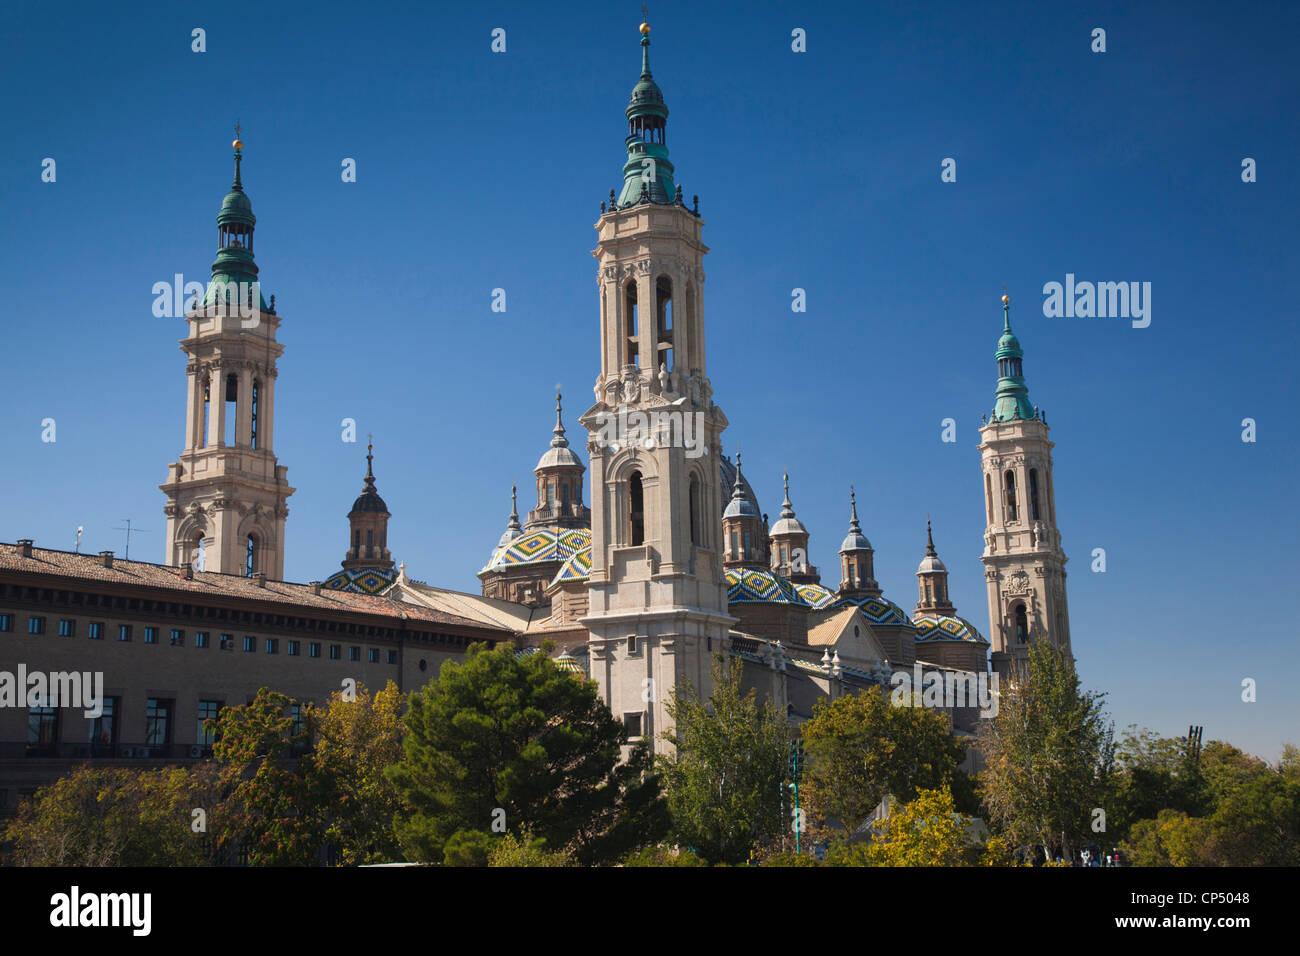 Spain, Aragon Region, Zaragoza Province, Zaragoza, Basilica de Nuestra Senora de Pilar - Stock Image